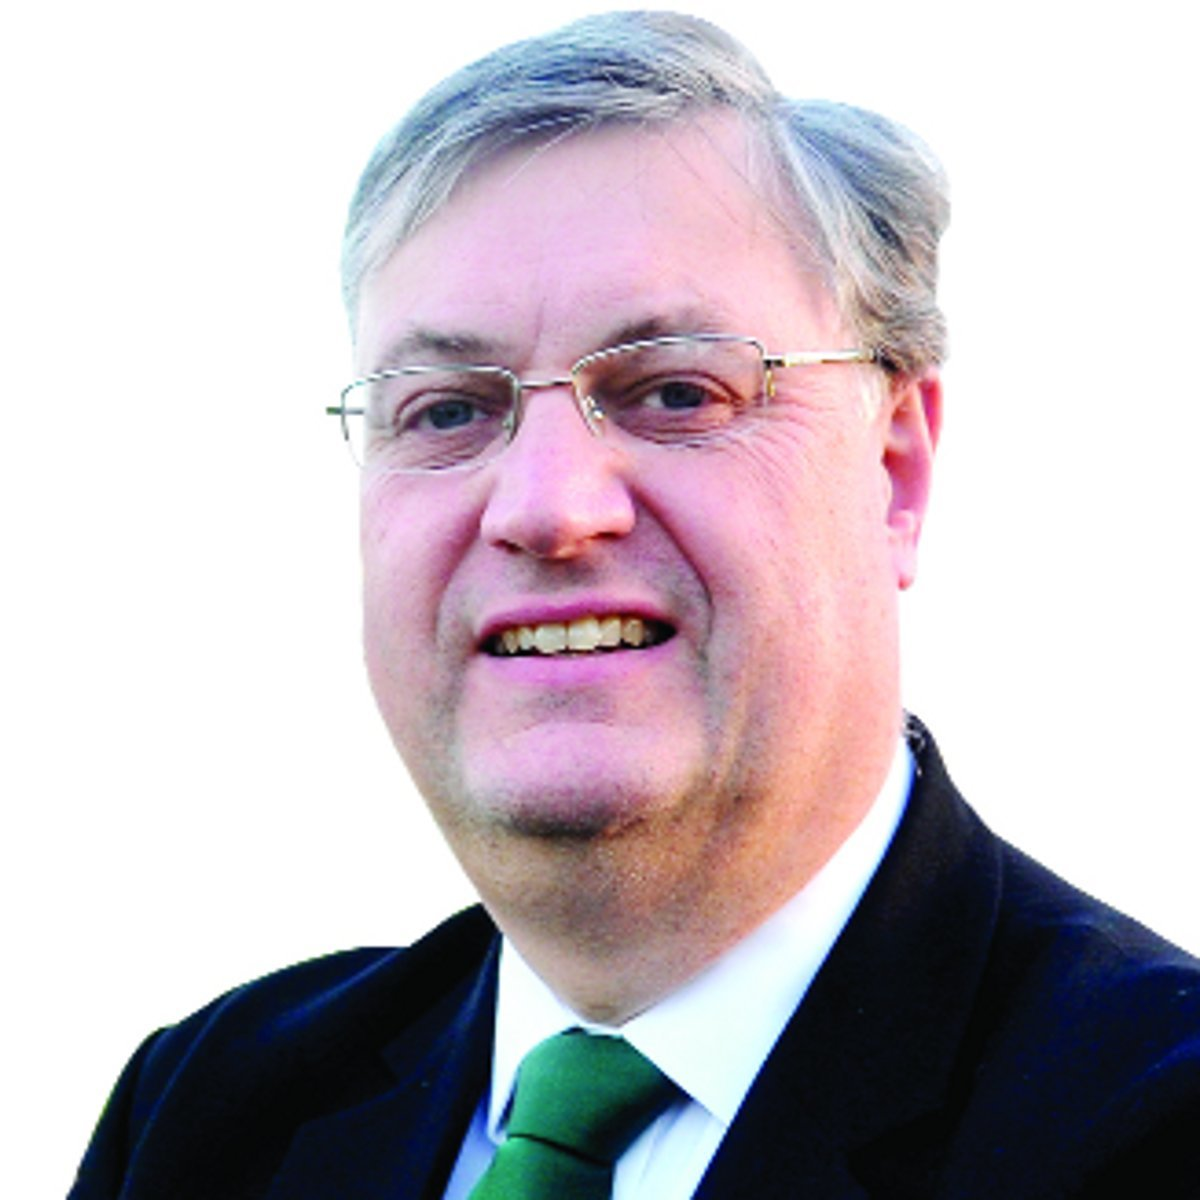 Let us plan, Swindon council leader tells Boris Johnson